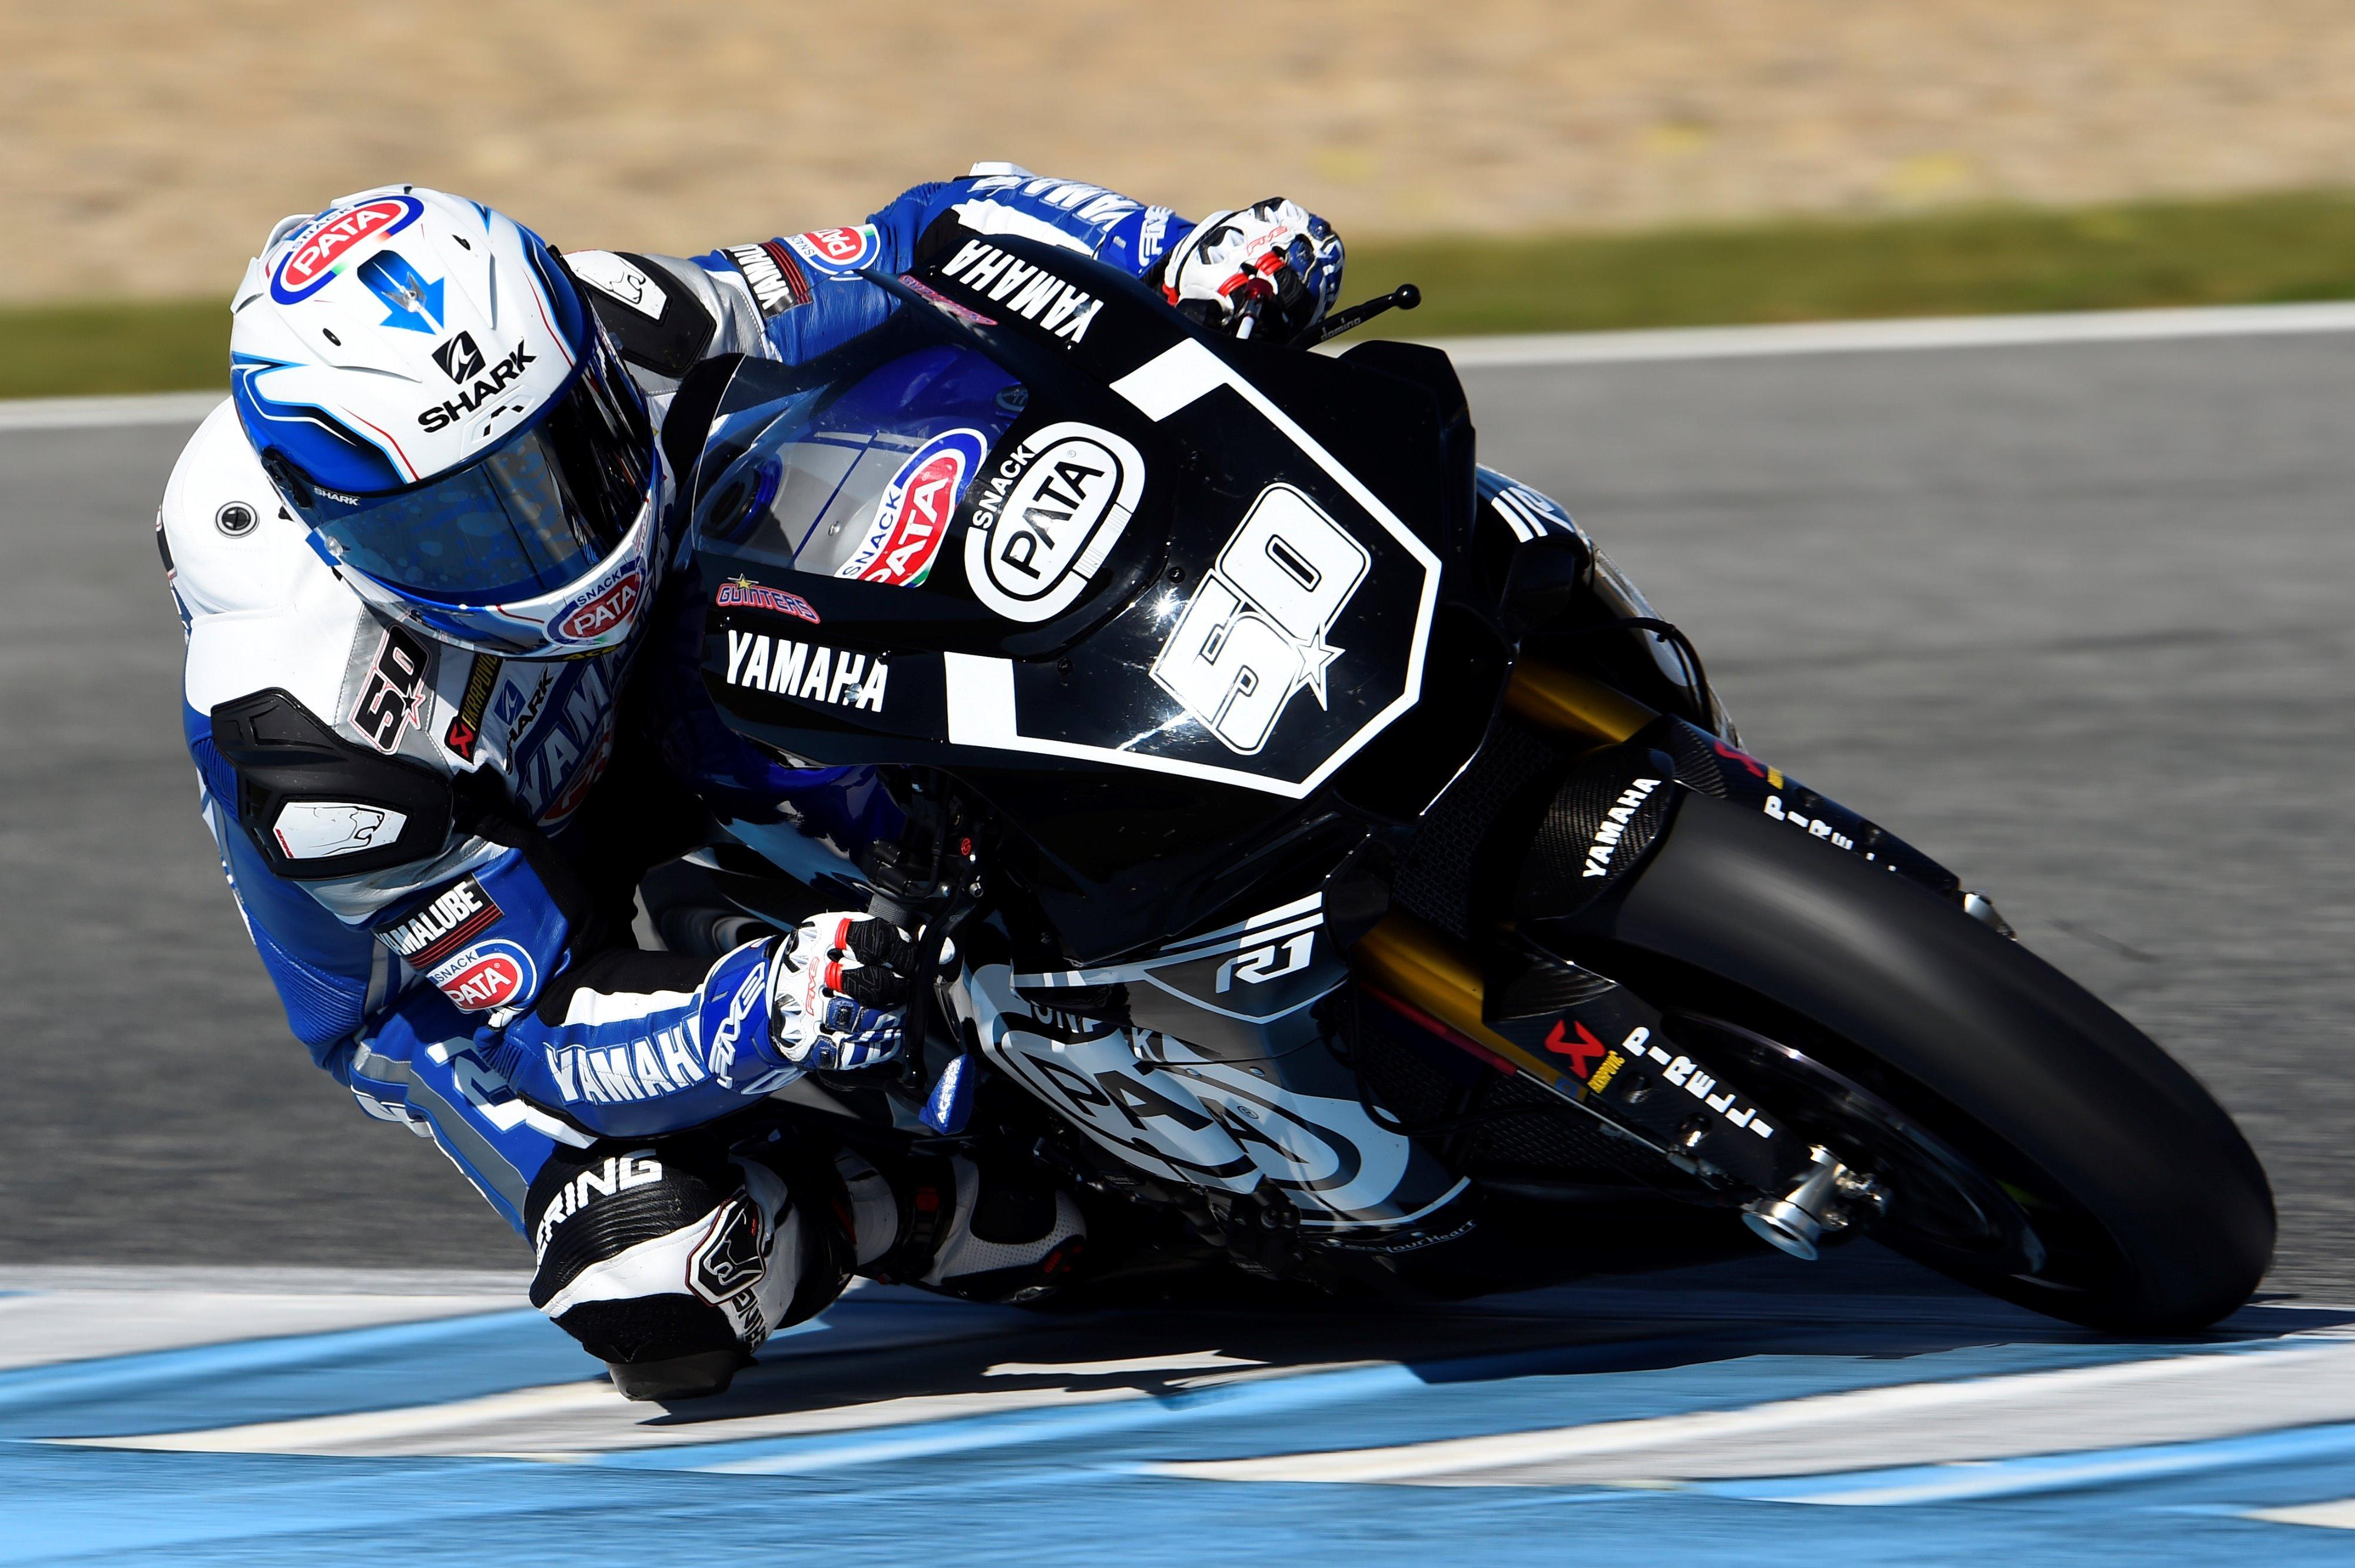 Pata Yamaha Wraps Up Pre-season WorldSBK Testing at Jerez - Yamaha Racing